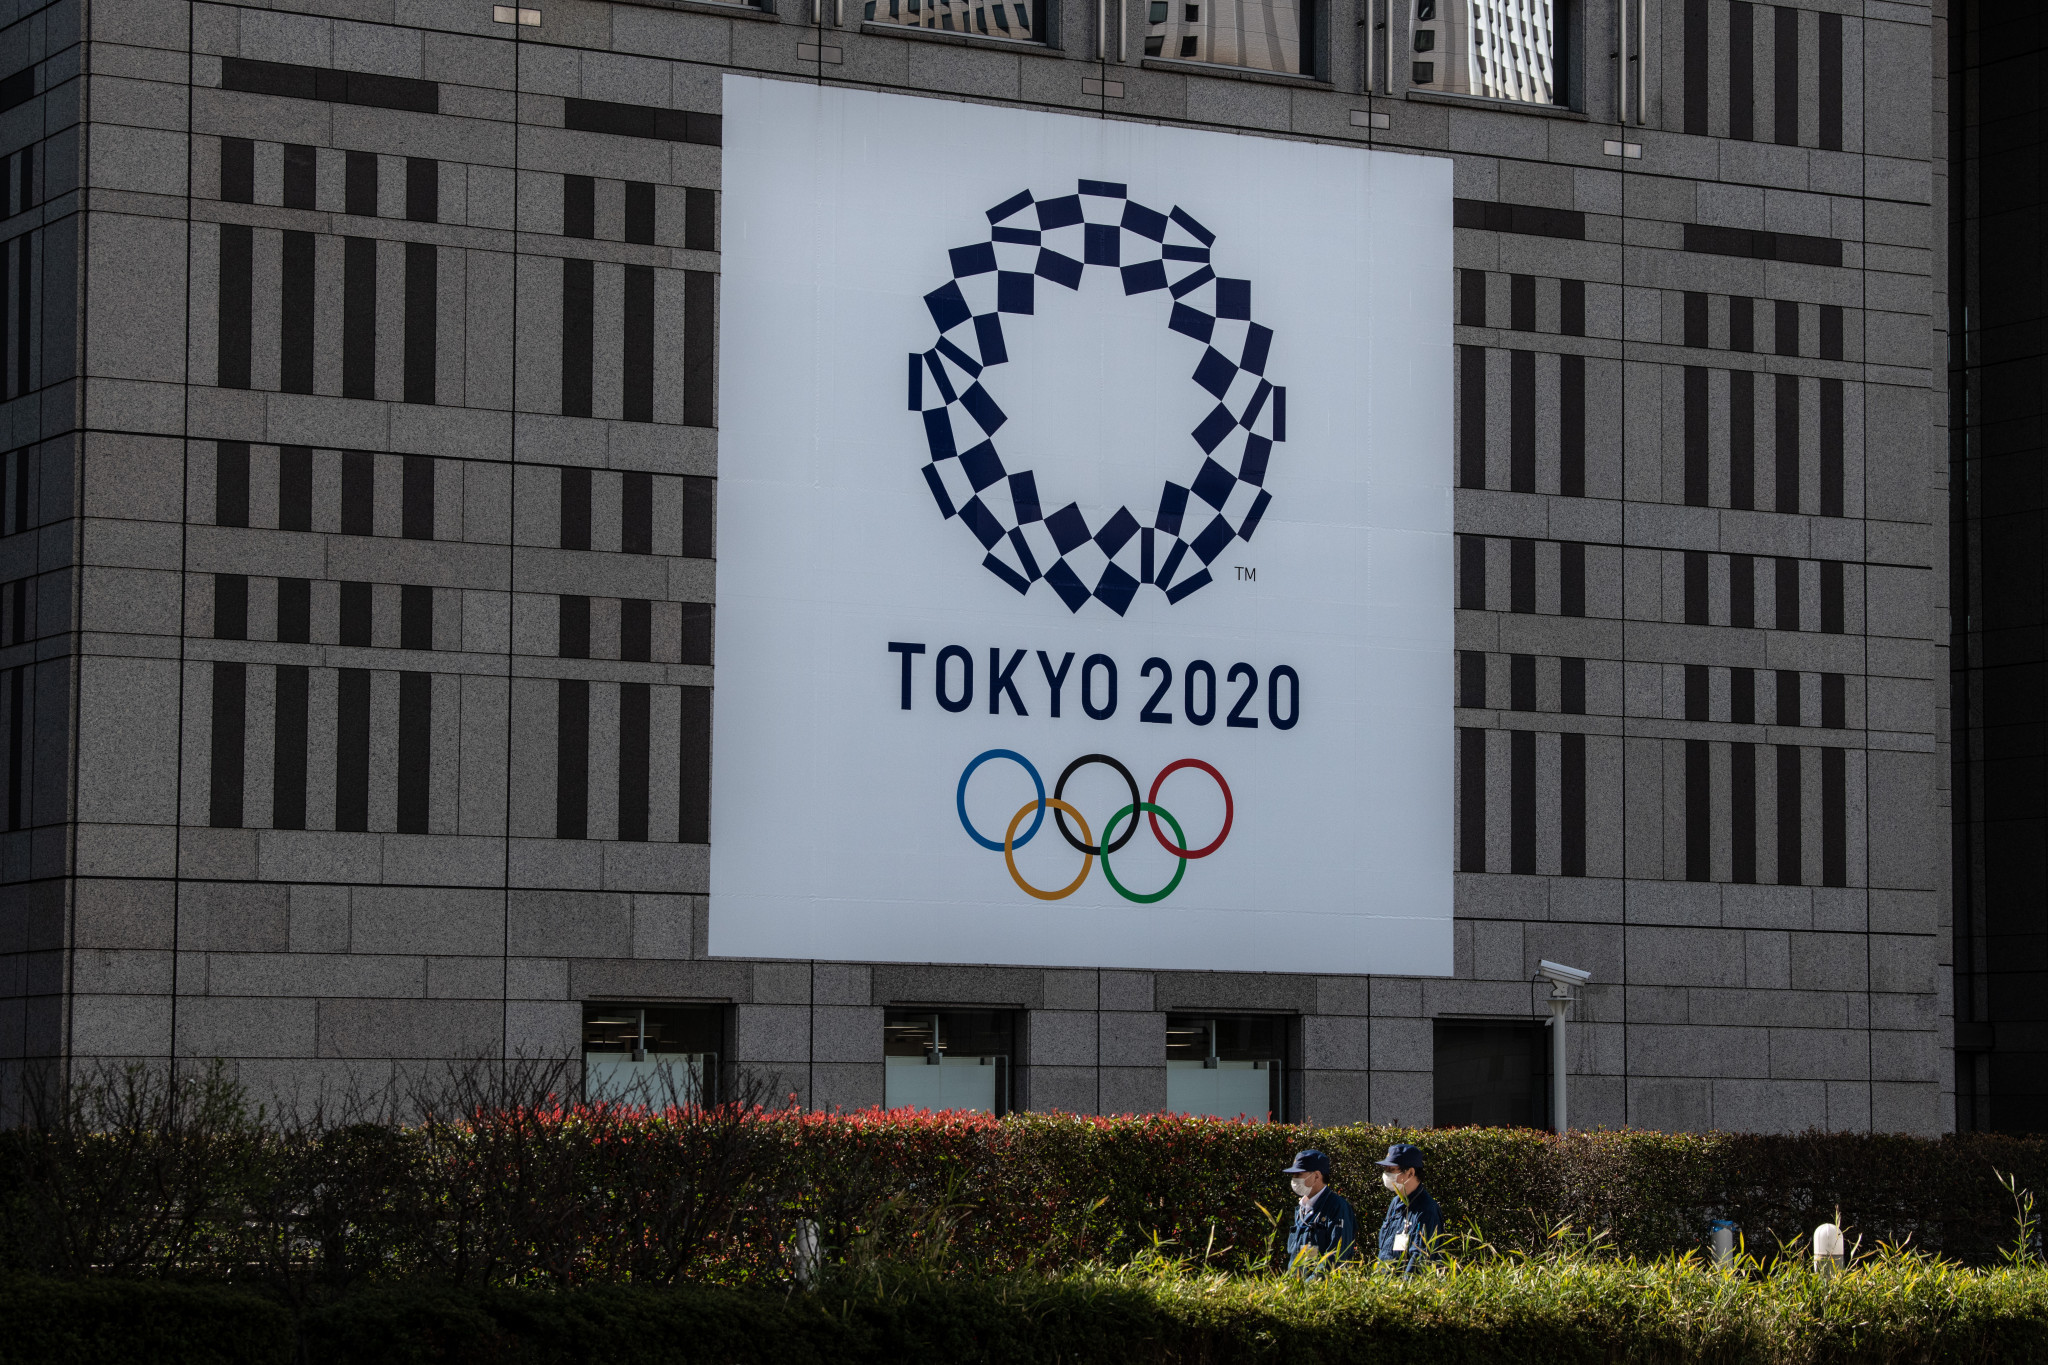 NOCs endorse IOC decision to postpone Tokyo 2020